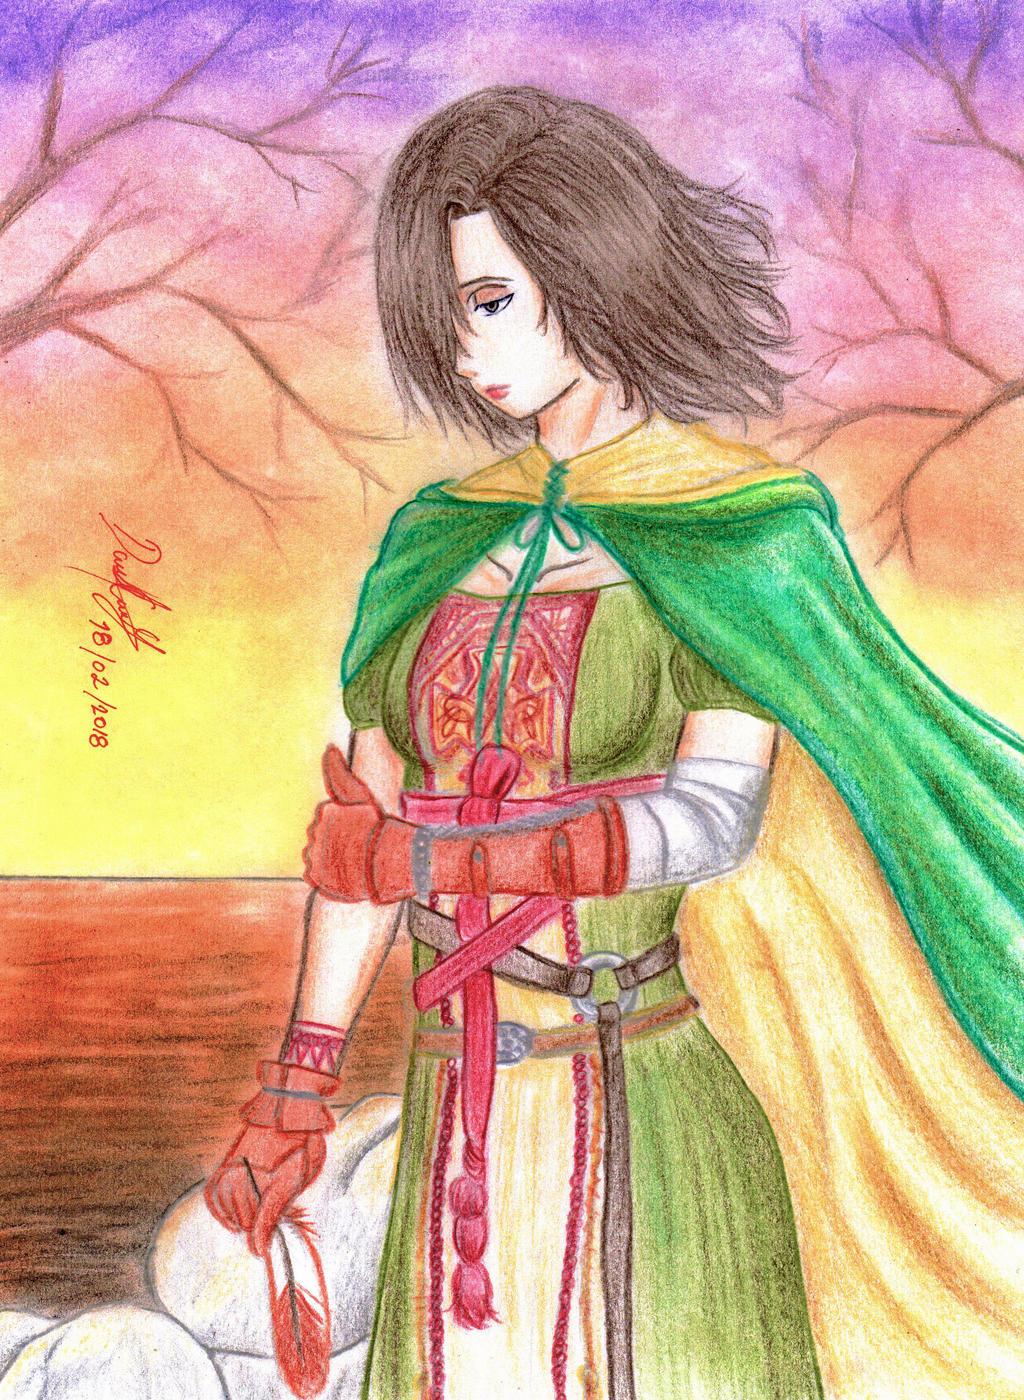 Emerald Herald (Dark Souls 2) by danielcamilo